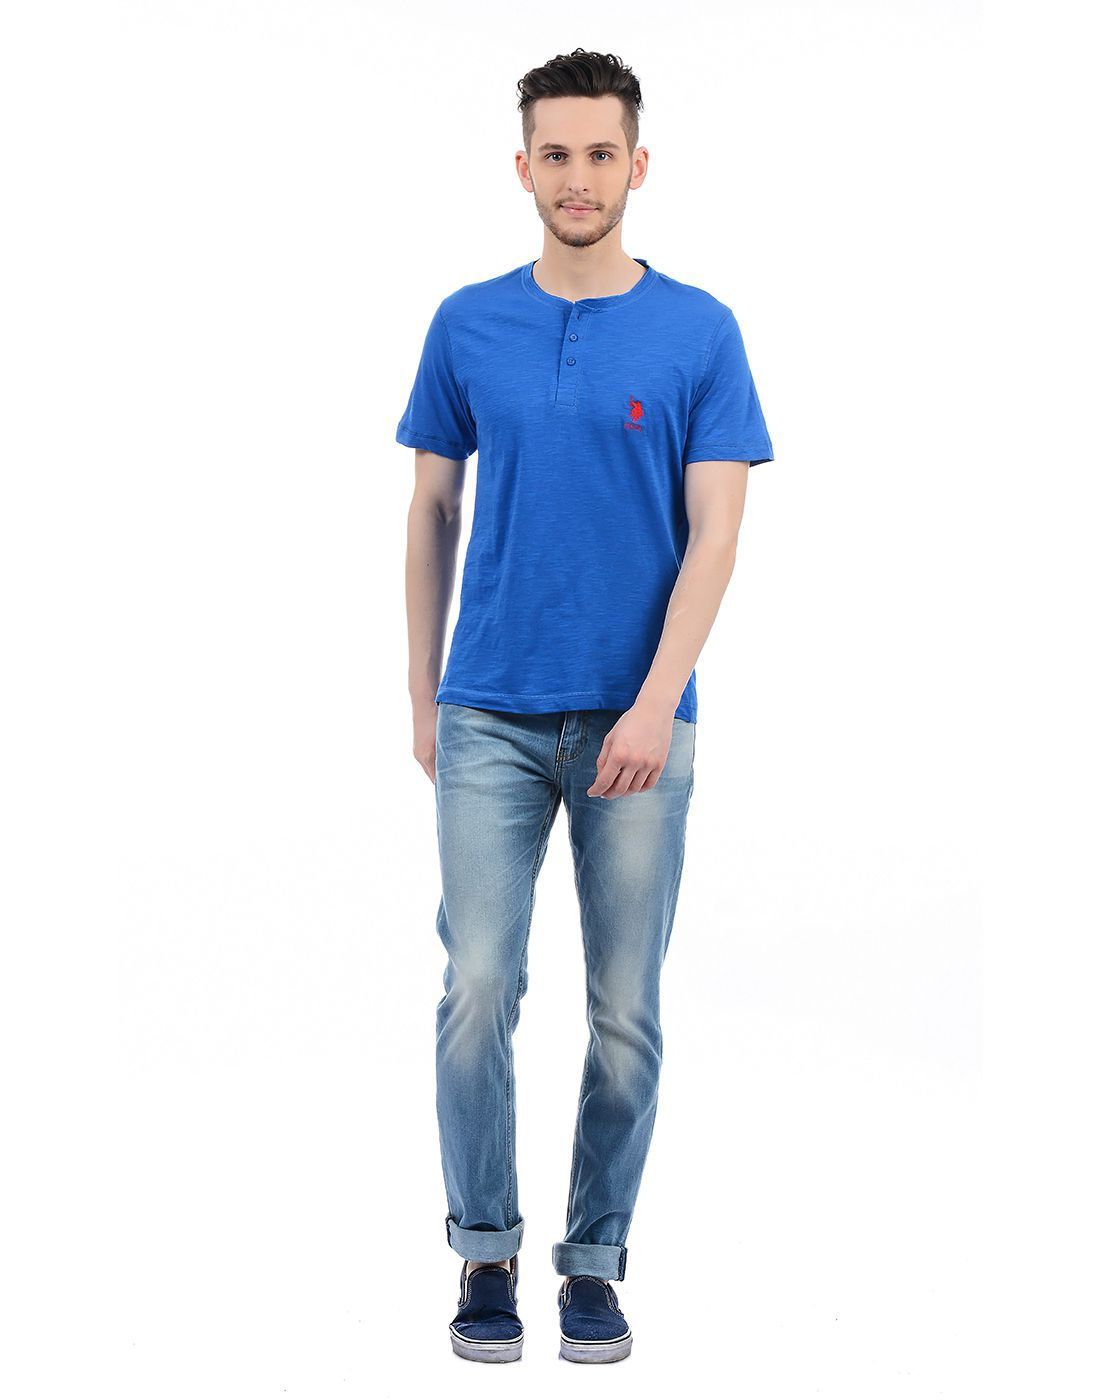 7415fb4458 U.s. Polo Assn. Blue Polo T Shirt